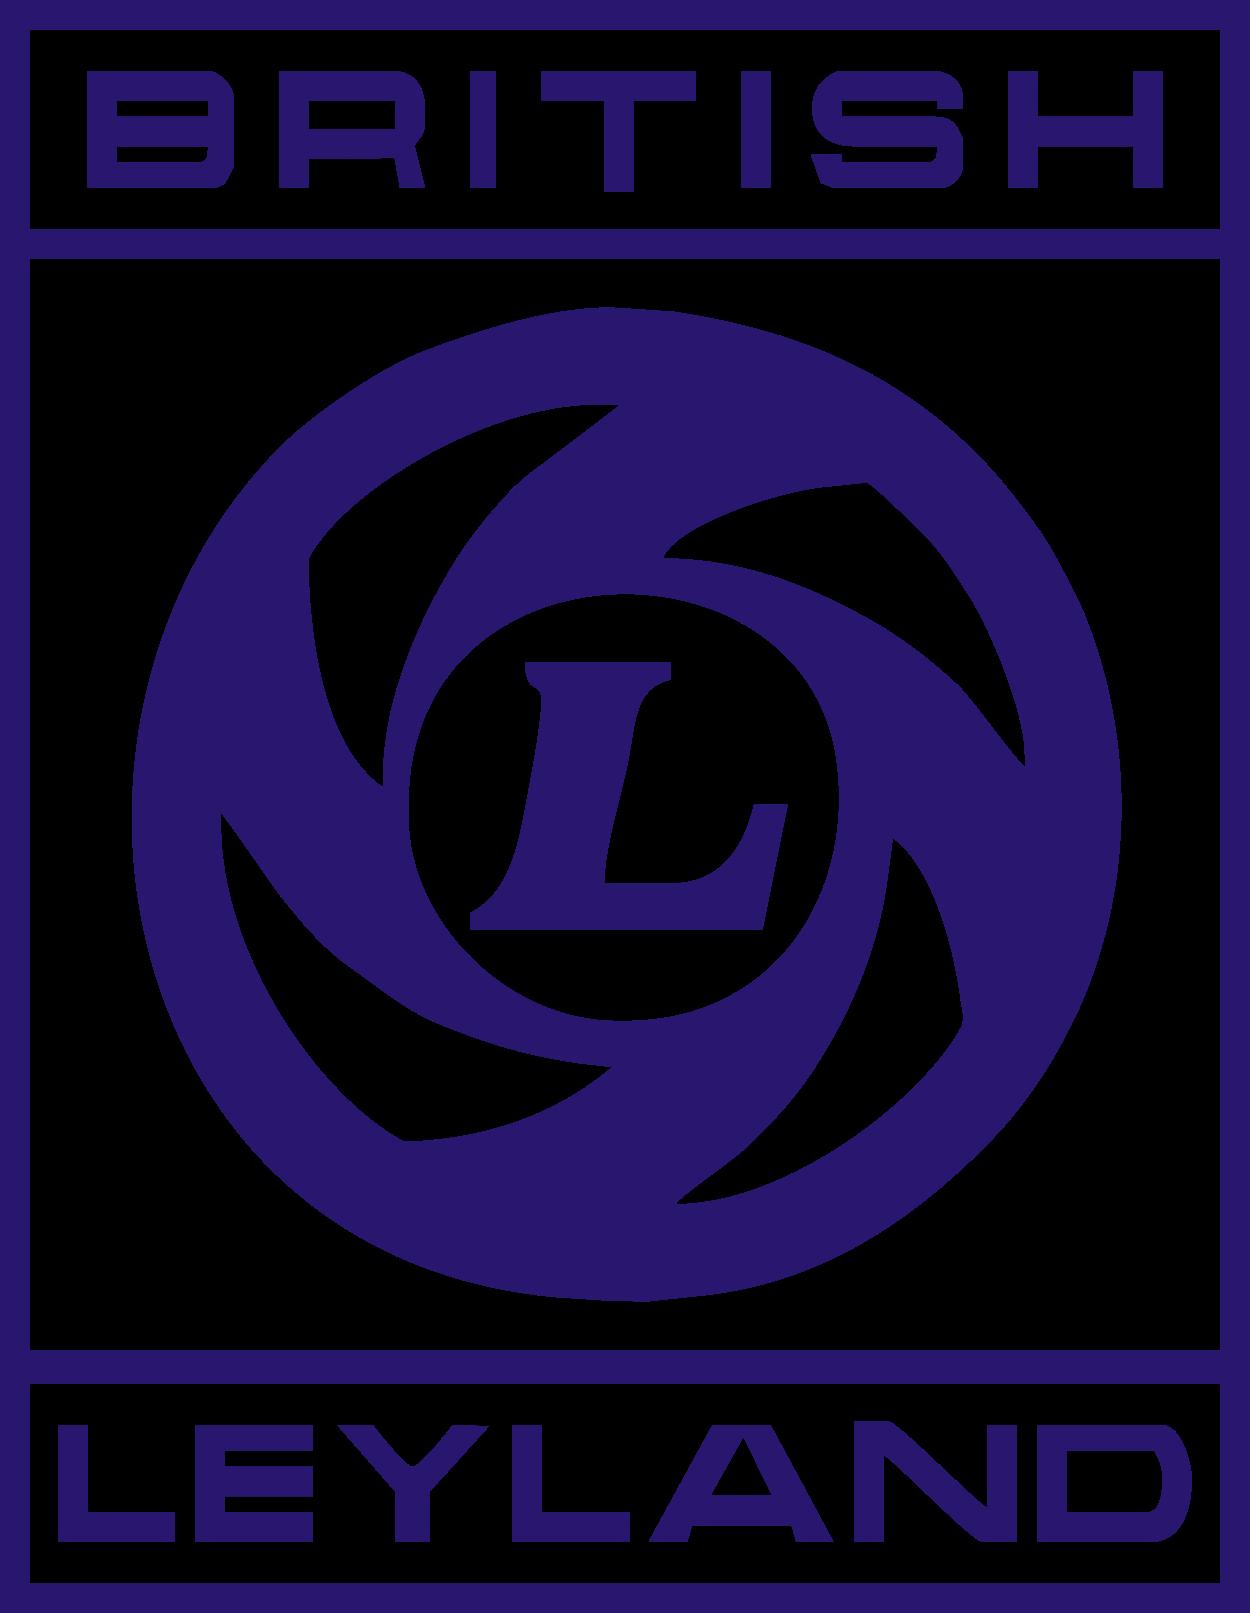 british leyland logo [ 1250 x 1613 Pixel ]